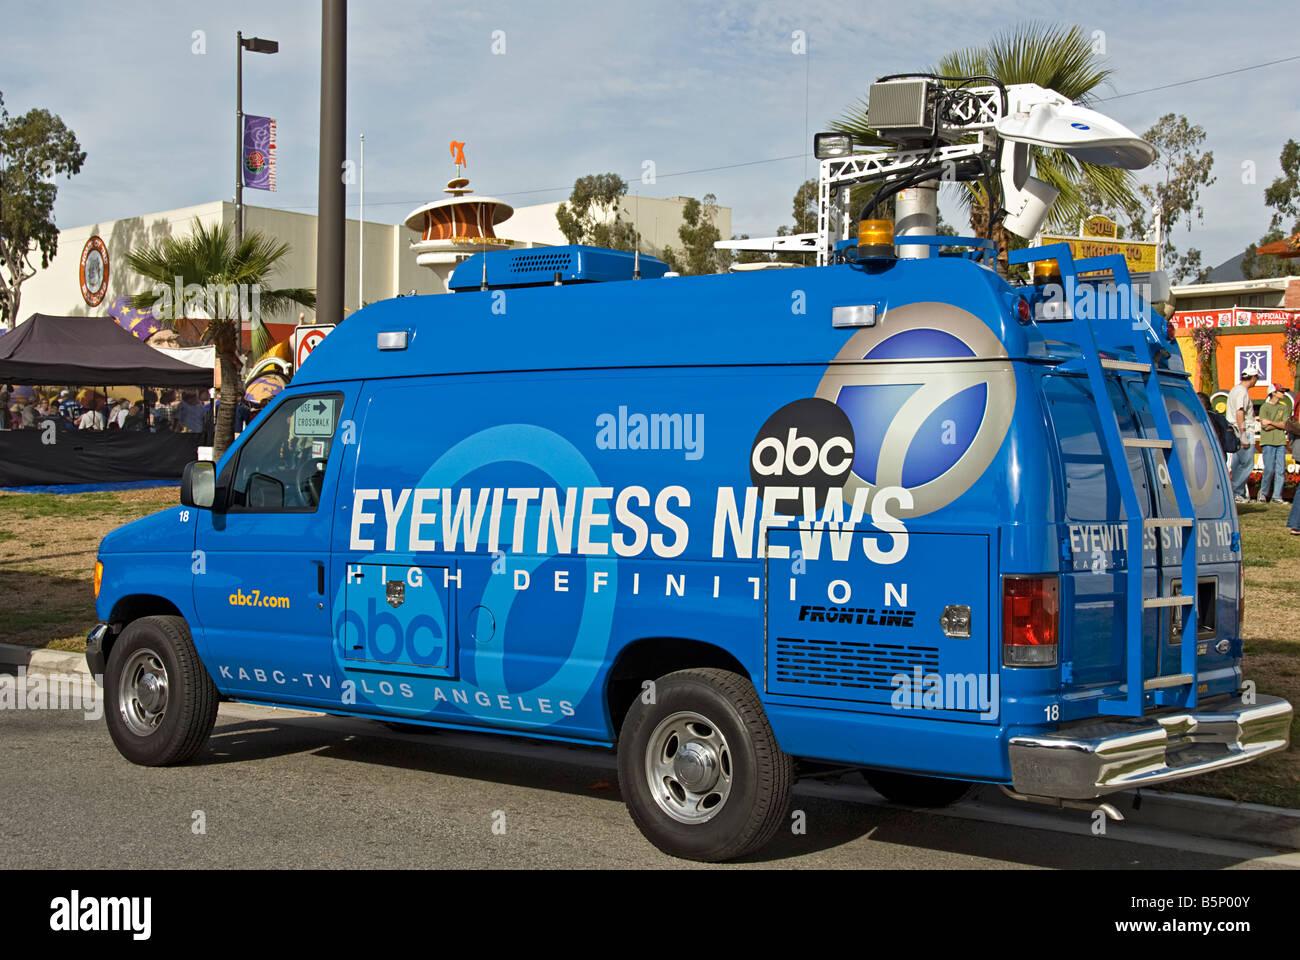 Los News Angeles Channel Eyewitness 7